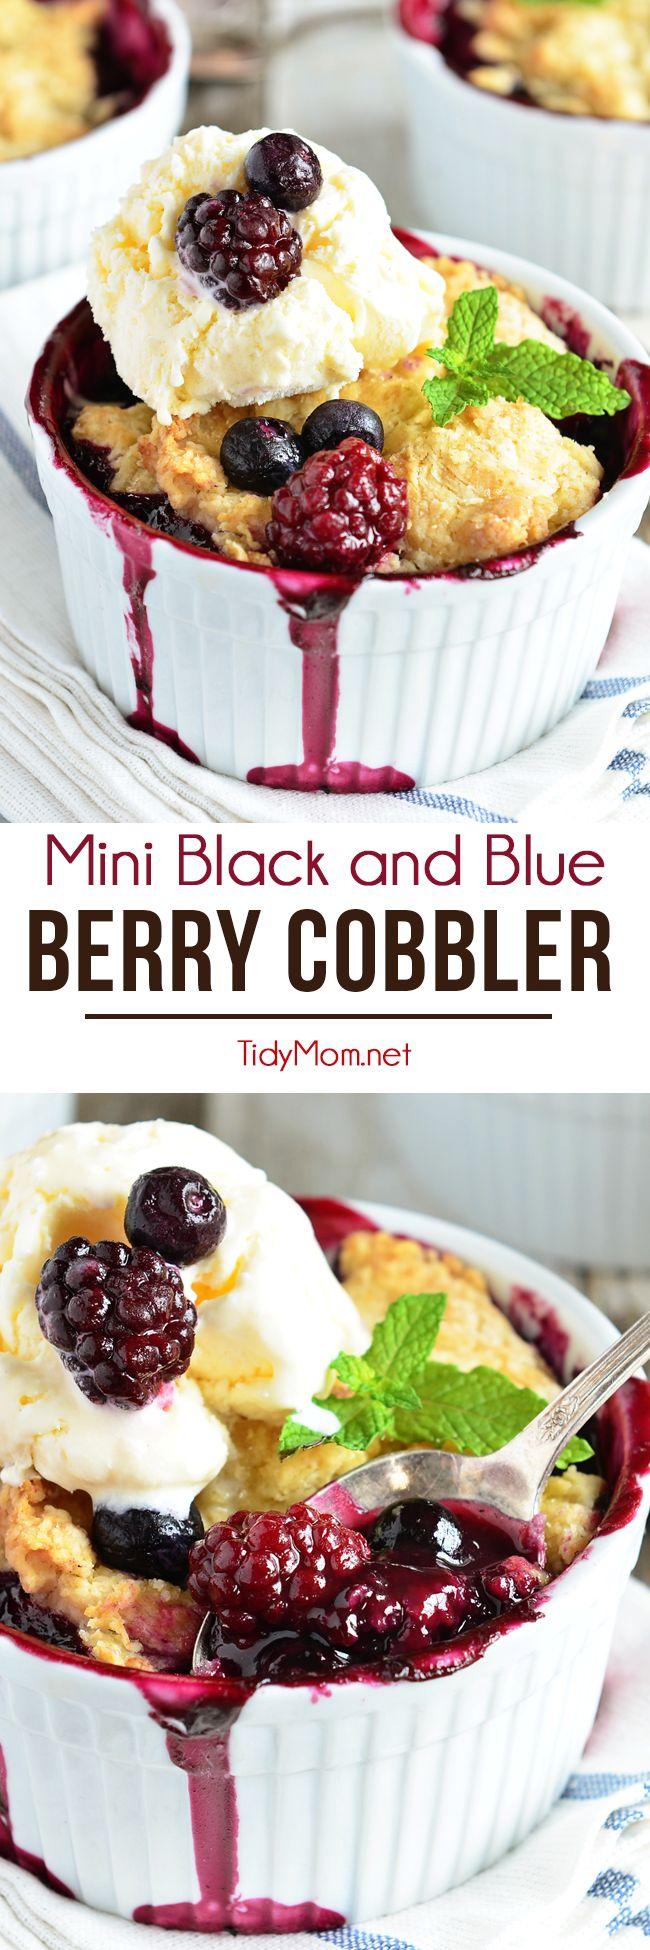 Mini Black and Blue Berry Cobbler recipe at TidyMom.net